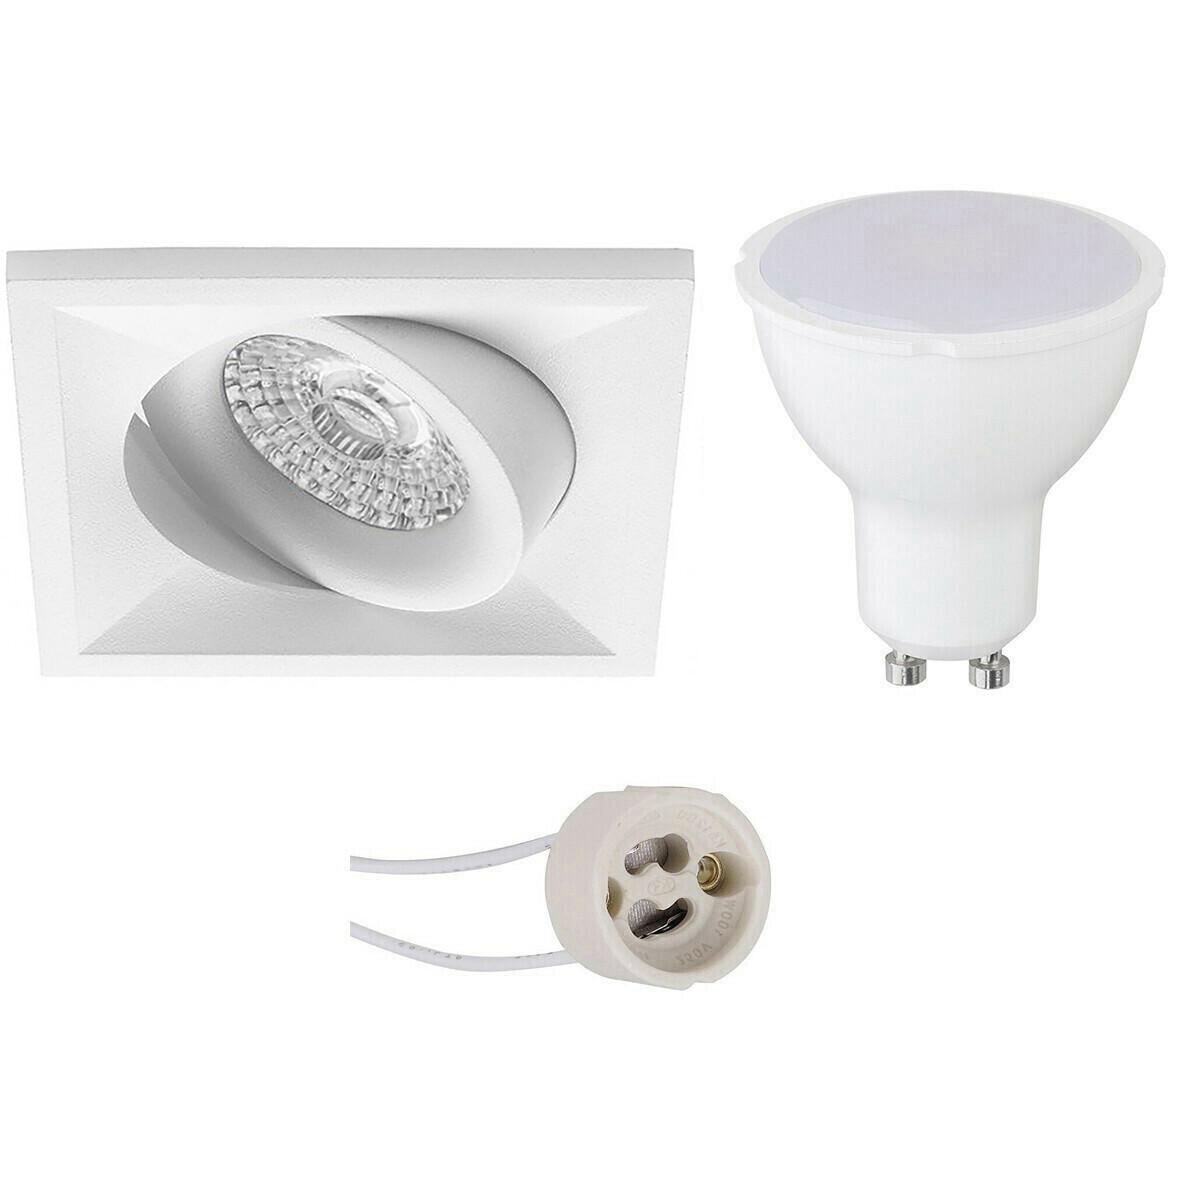 LED Spot Set - Aigi - Pragmi Qiundo Pro - GU10 Fitting - Inbouw Vierkant - Mat Wit - 8W - Warm Wit 3